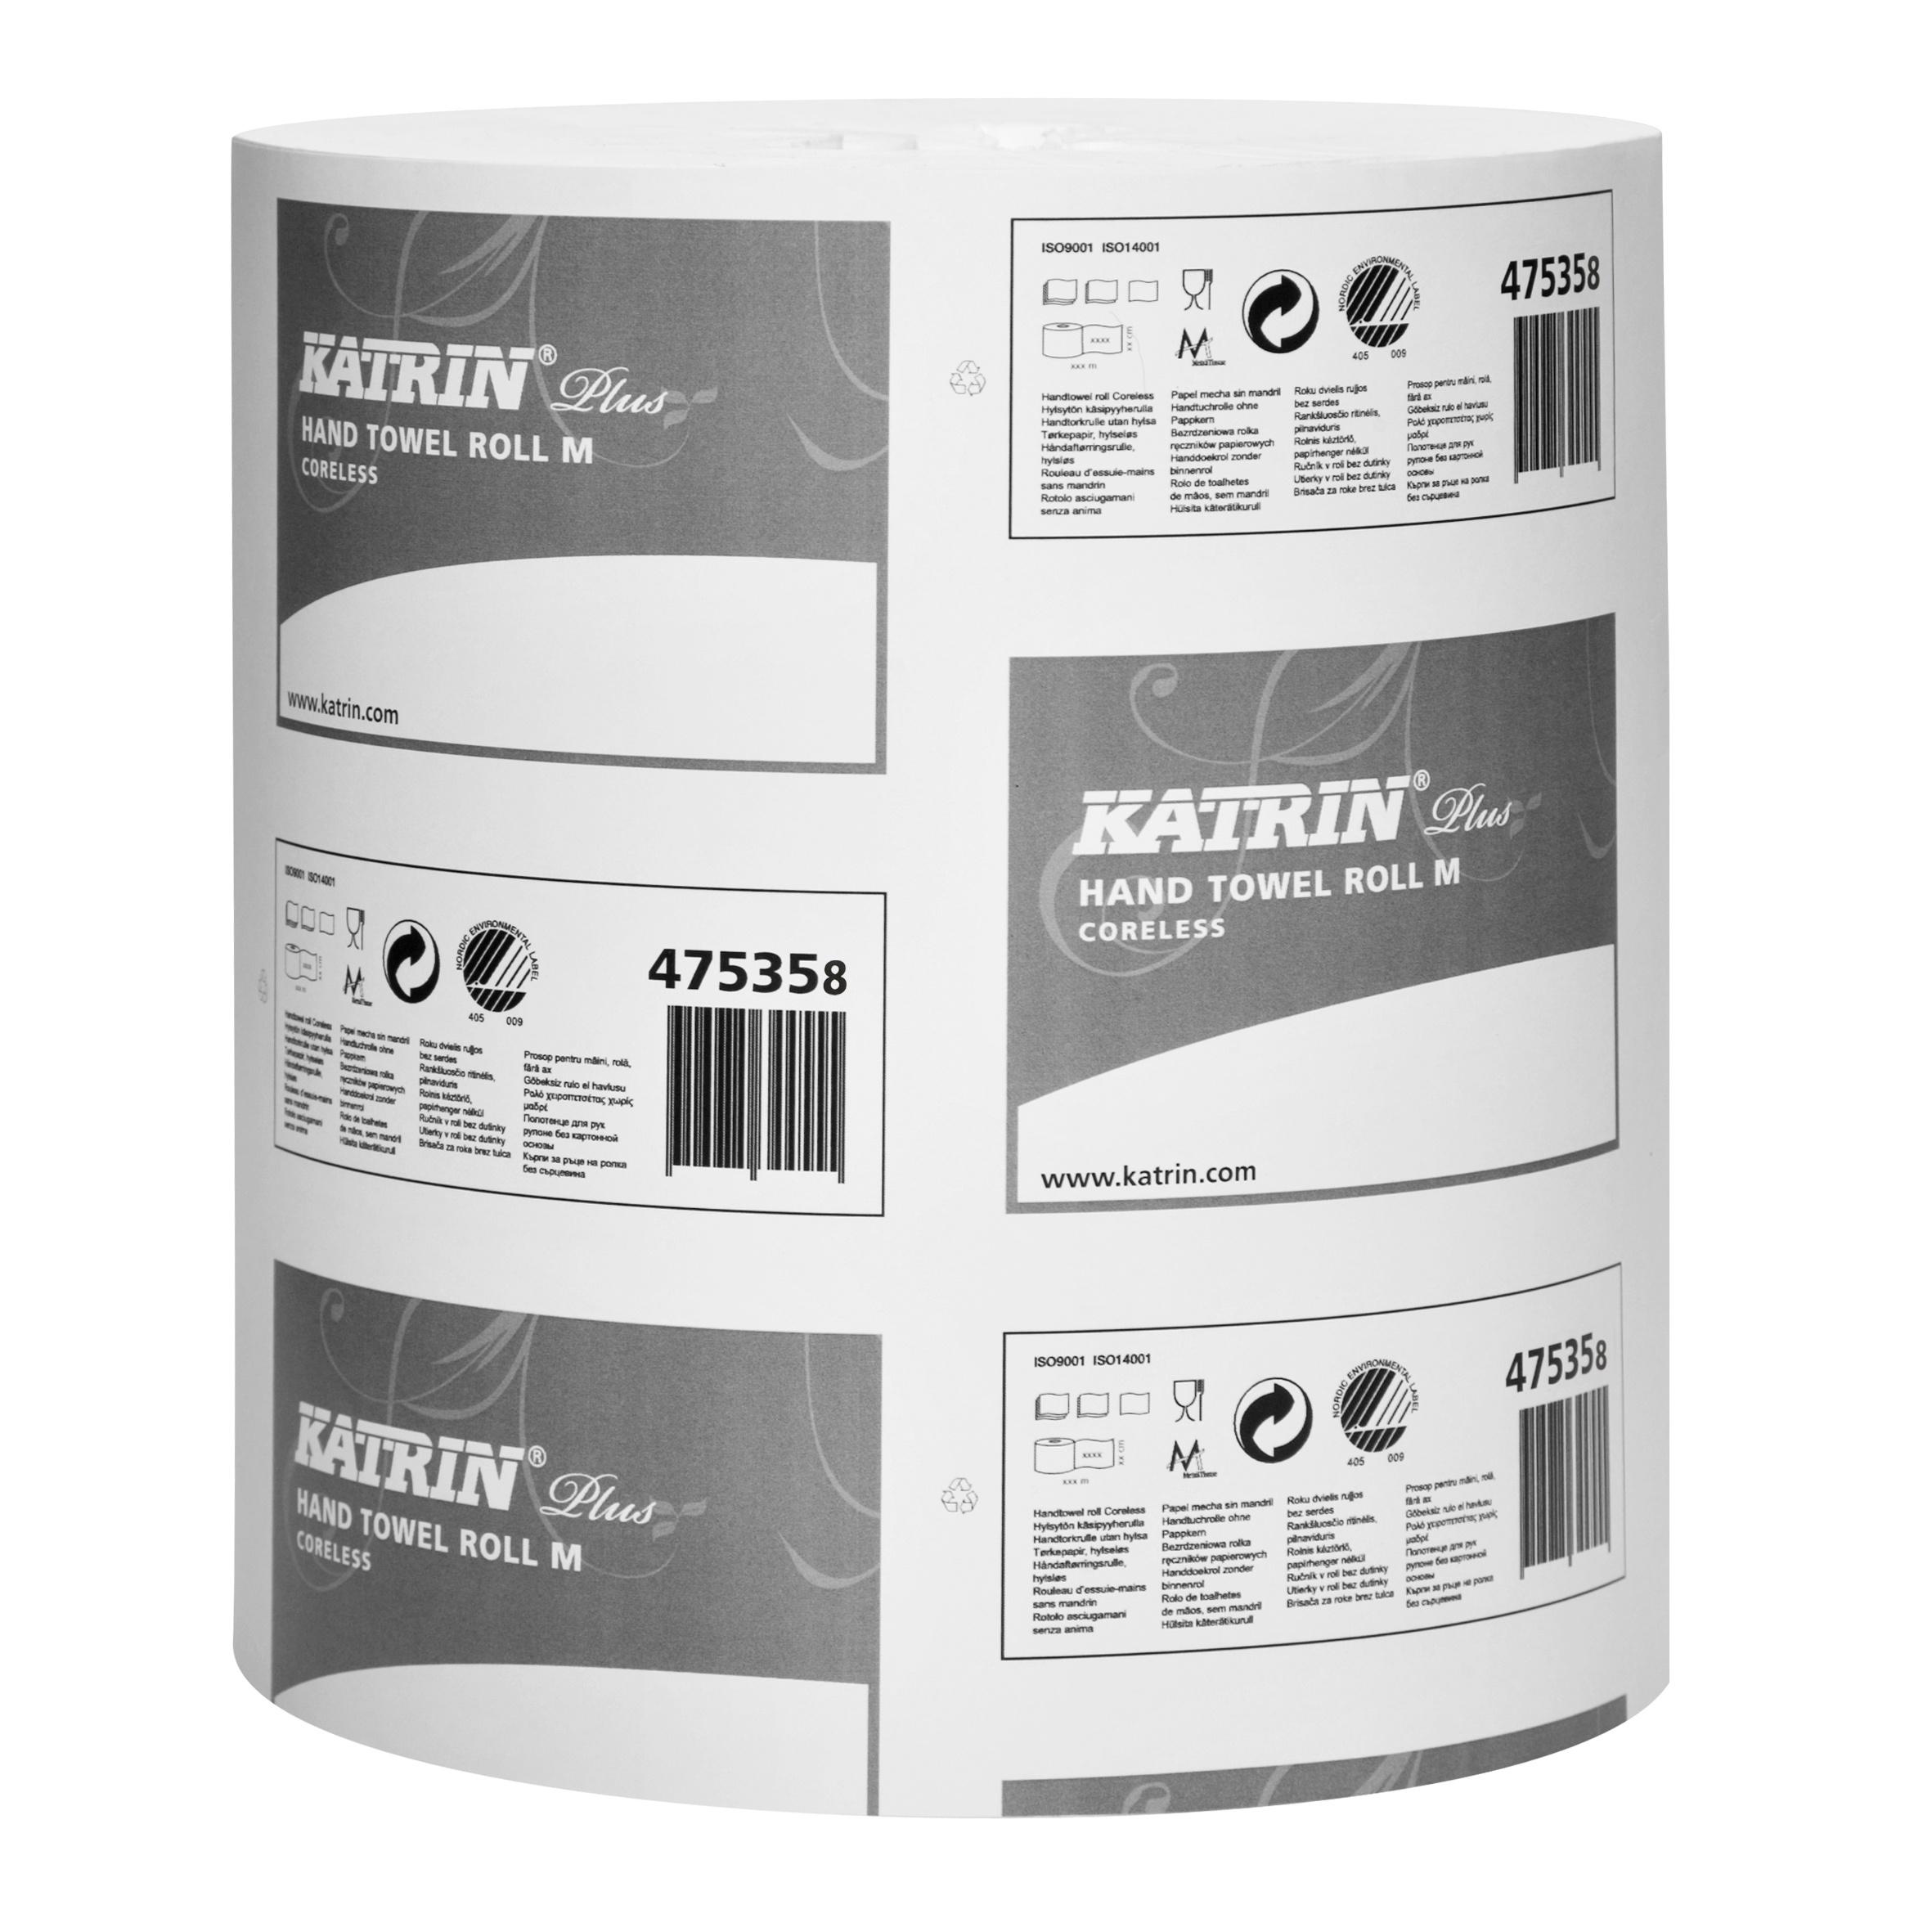 Katrin PLUS Hand Towel Roll M Coreless 475355